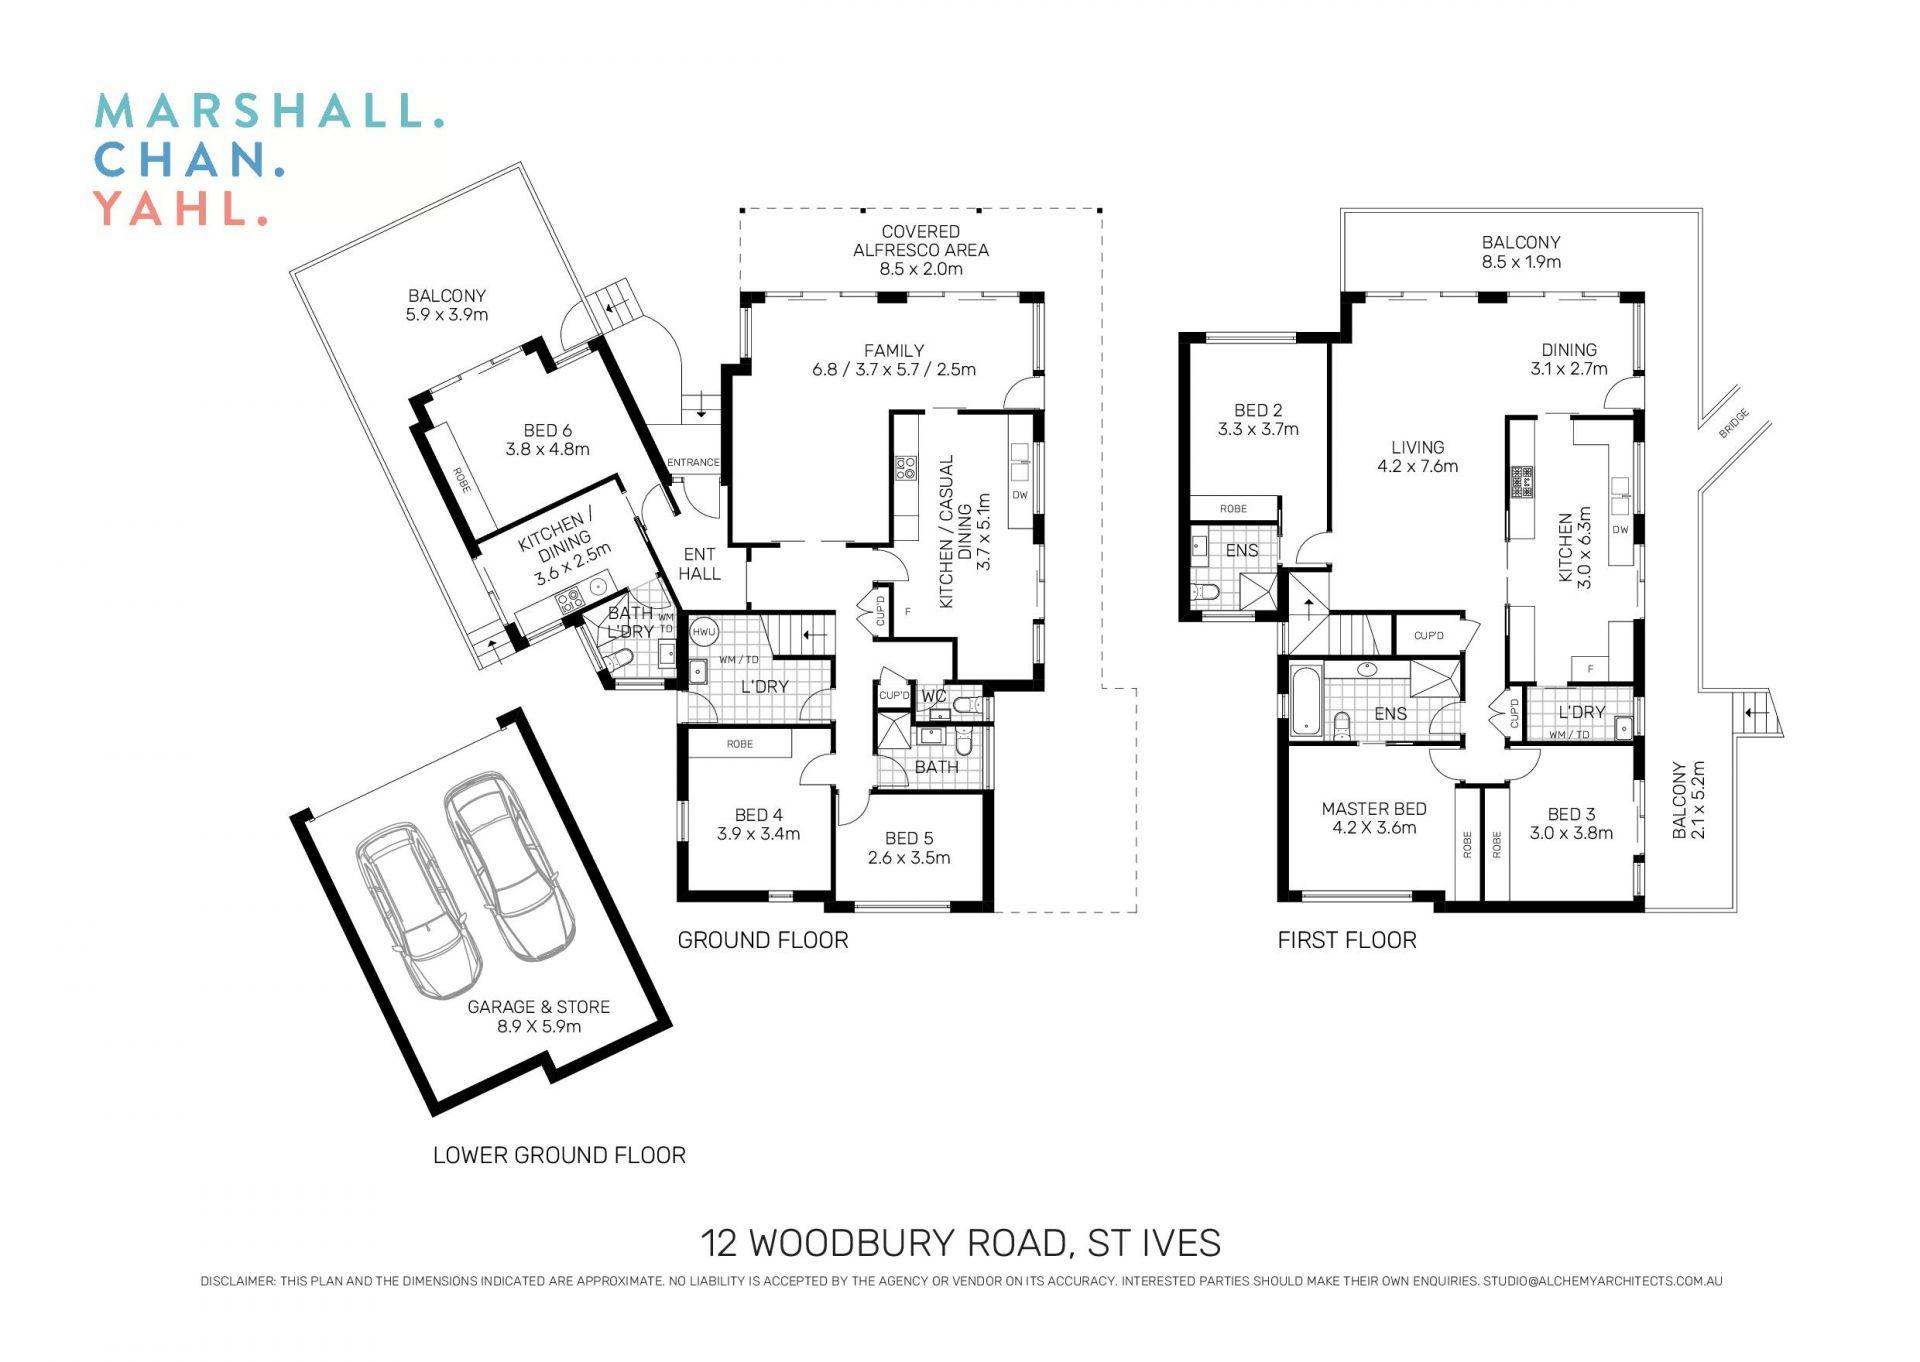 12 Woodbury Road St Ives 2075